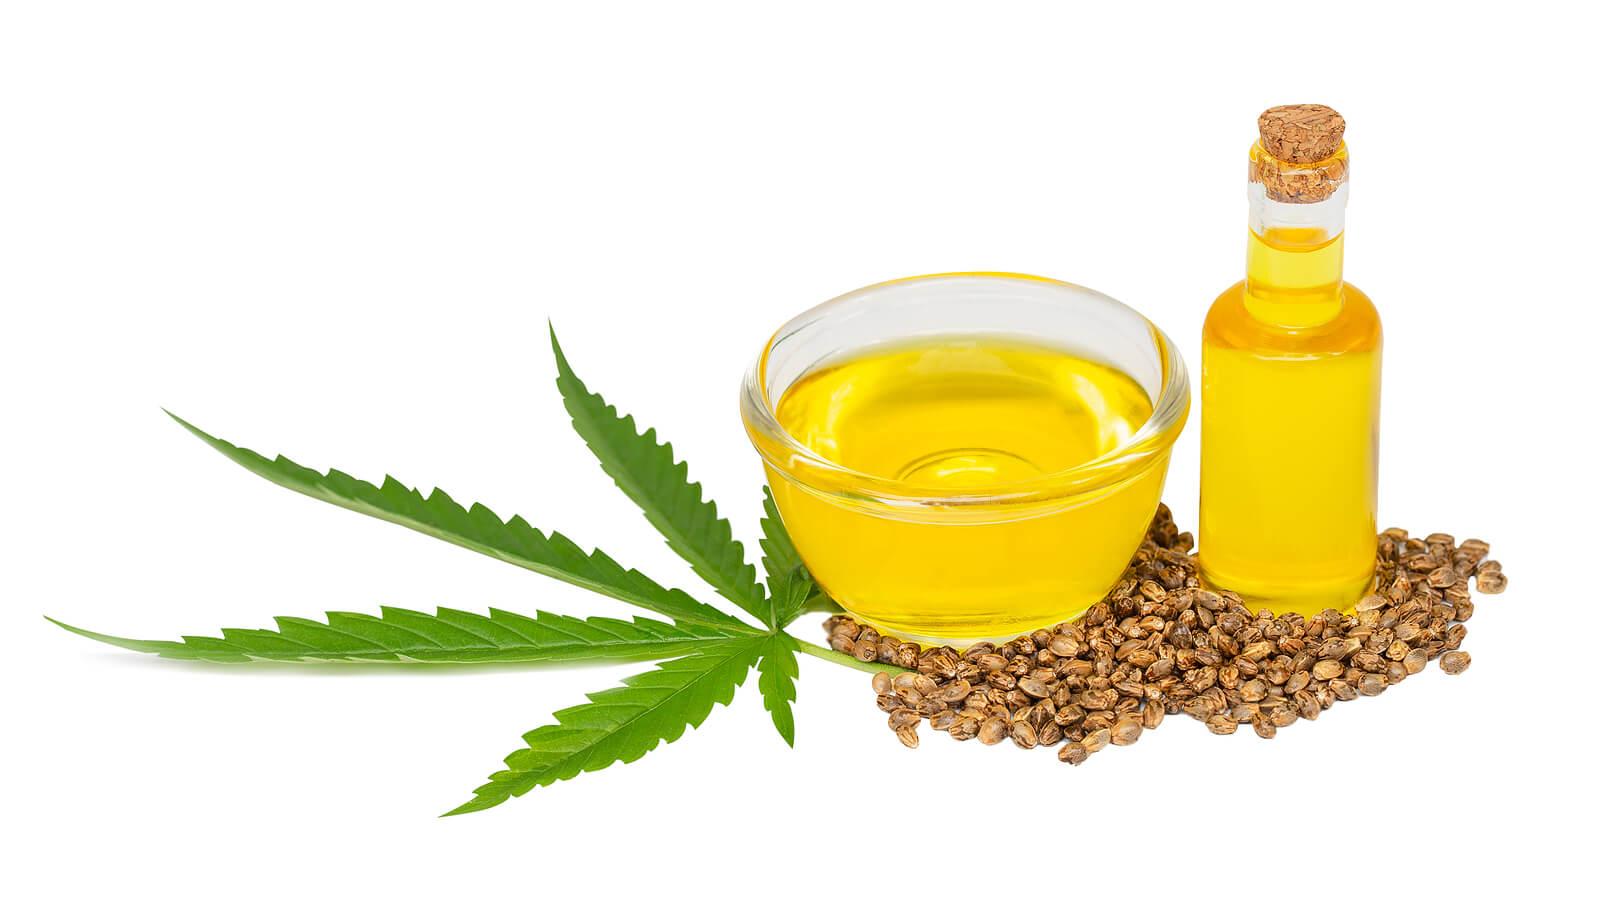 Buy Marijuana Seeds In Glendale